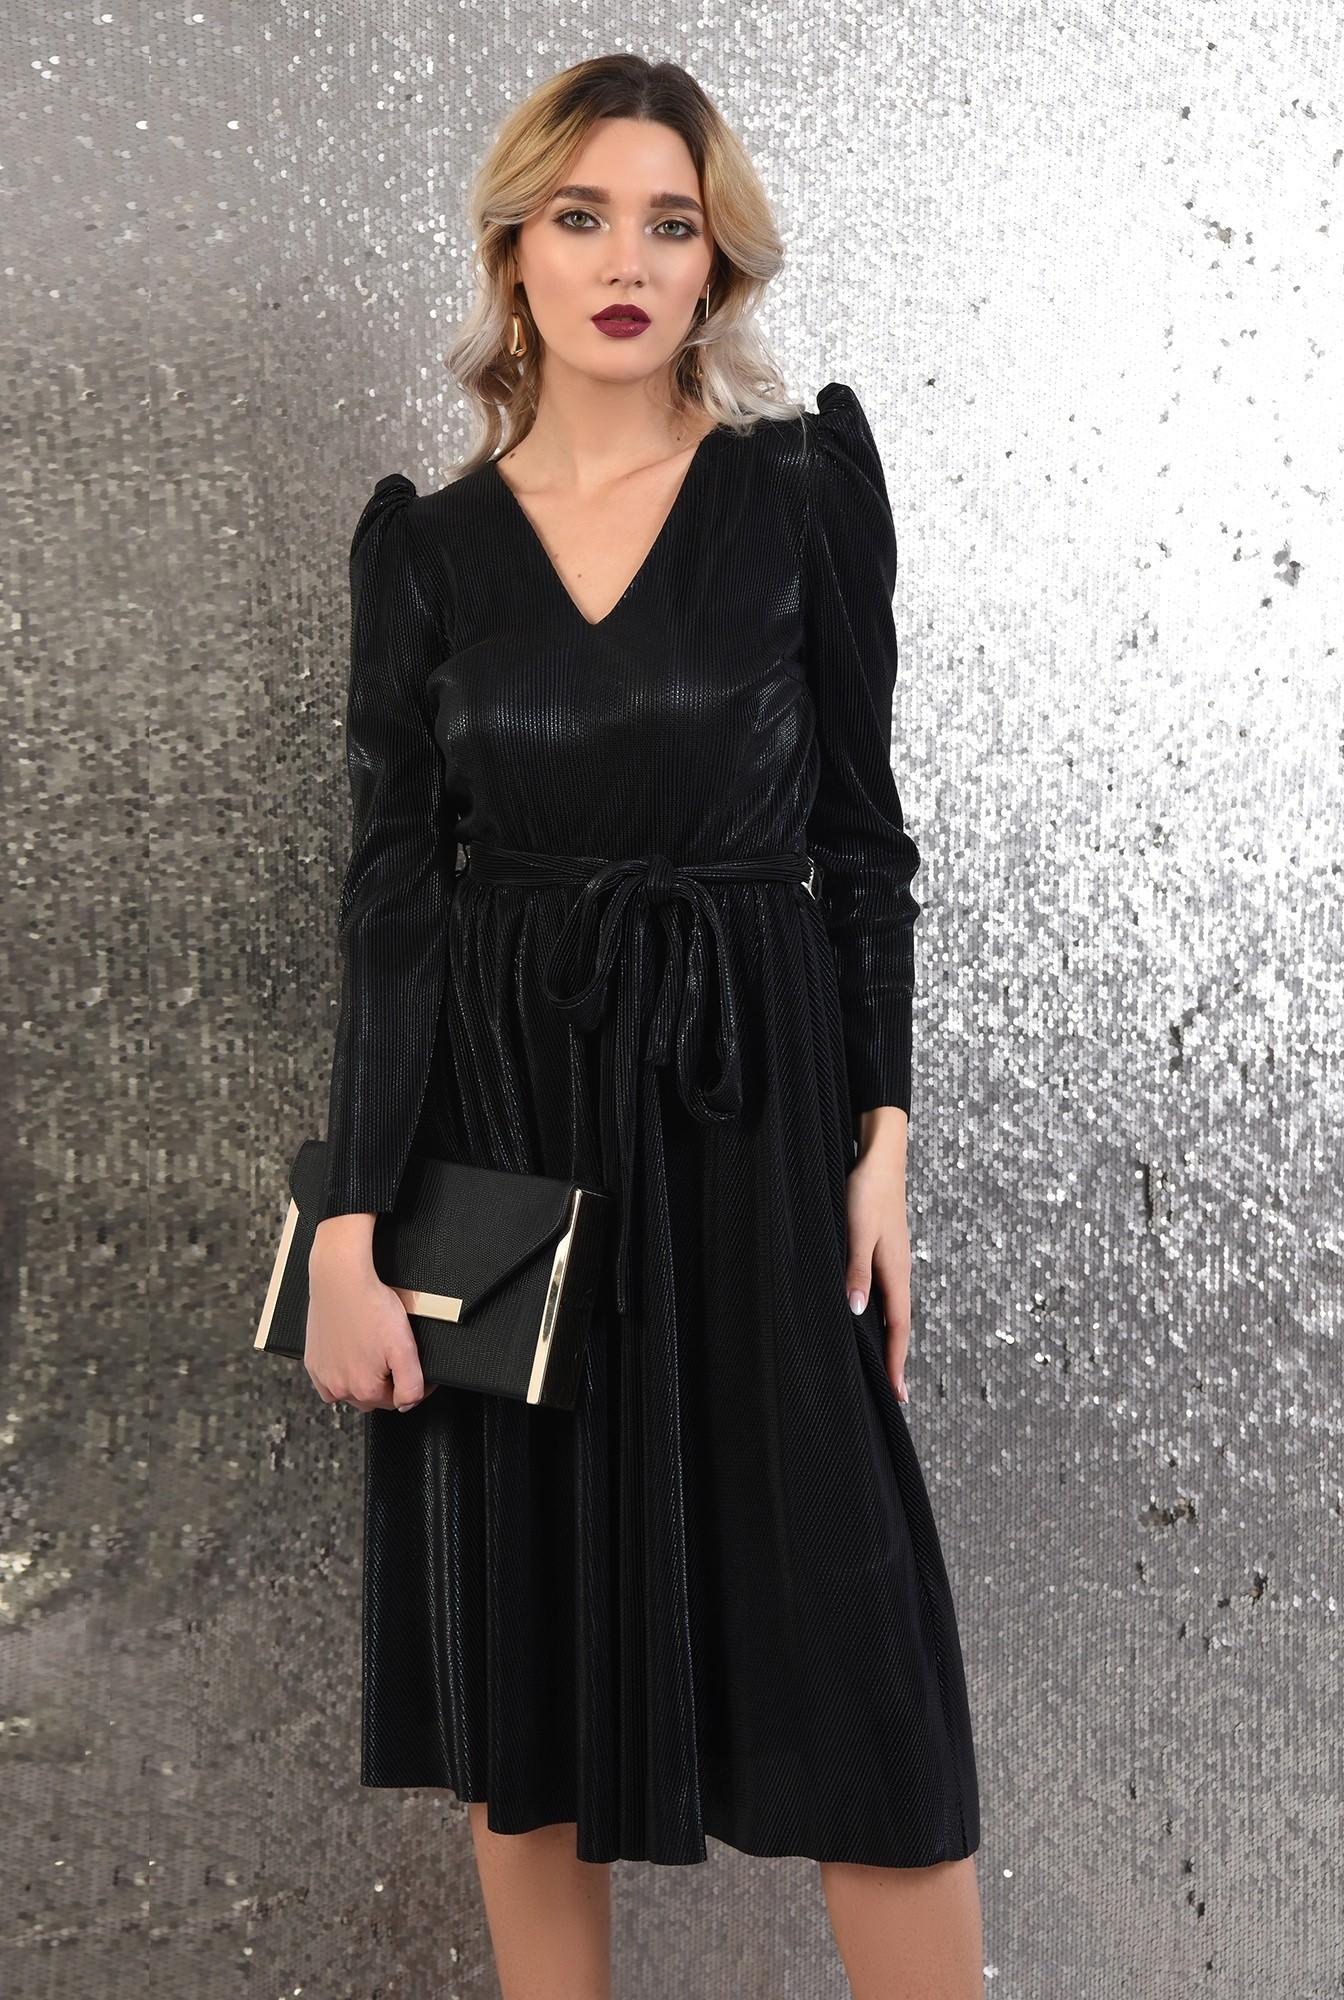 0 -  rochie neagra, eleganta, Poema, lurex creponat, anchior, funda la talie